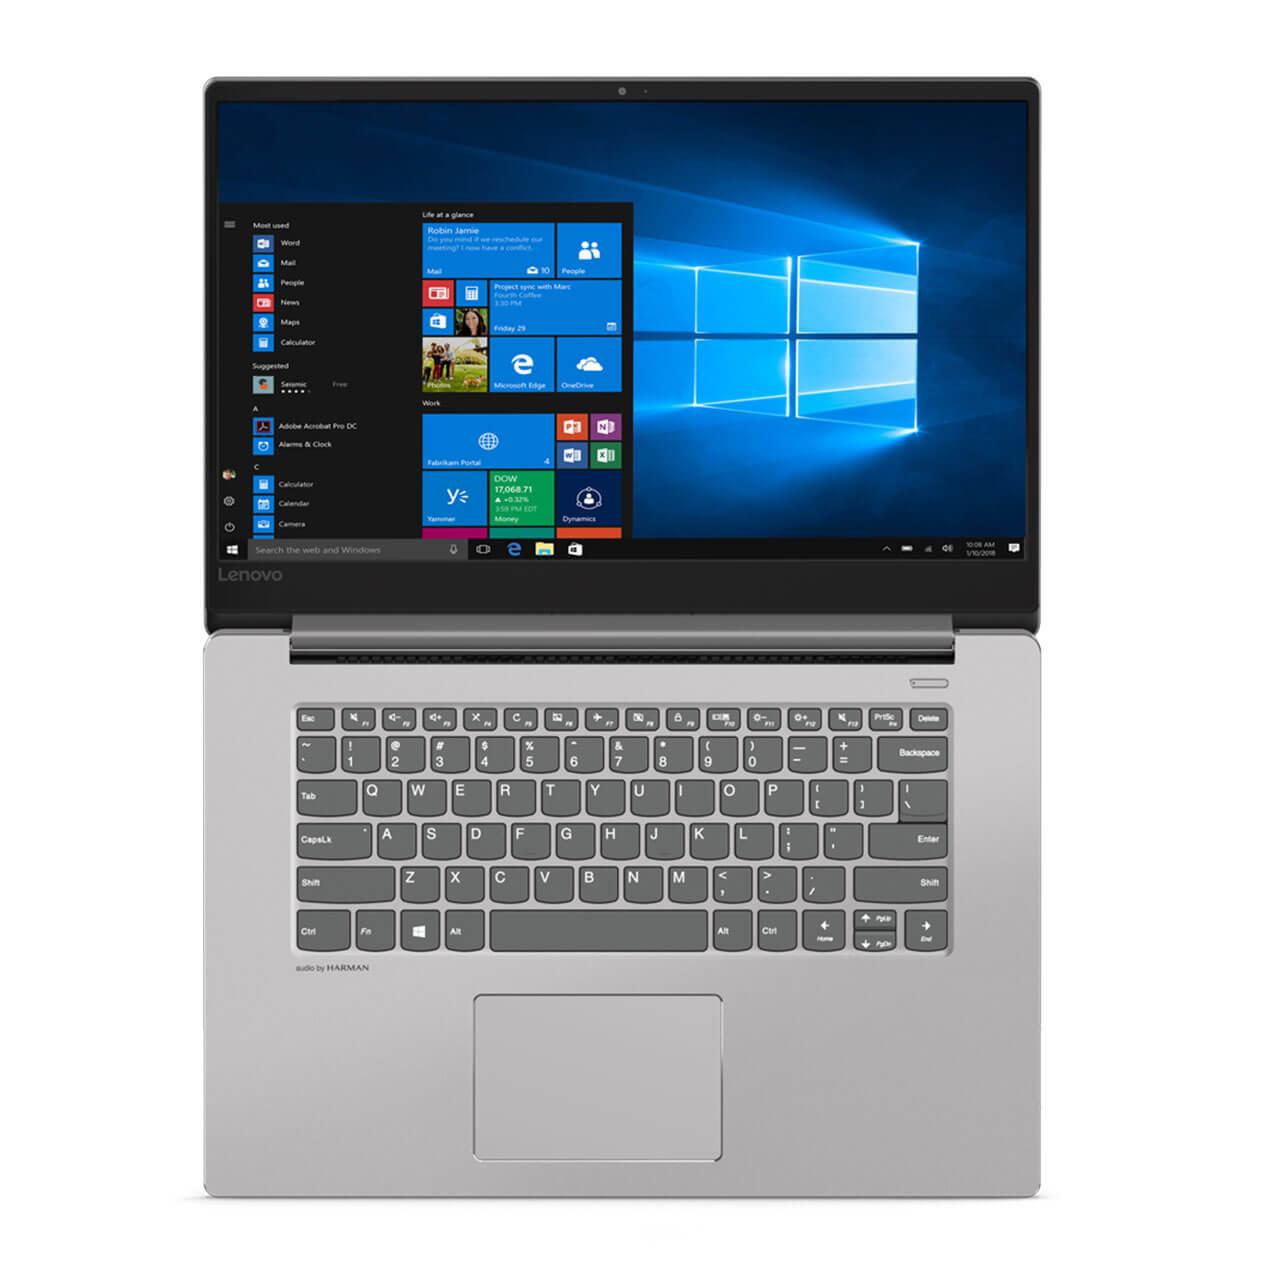 "Lenovo Ideapad 530S, 15.6"", i7-8550U, 8 GB RAM, 512GB SSD, Win 10 Home 64 9"